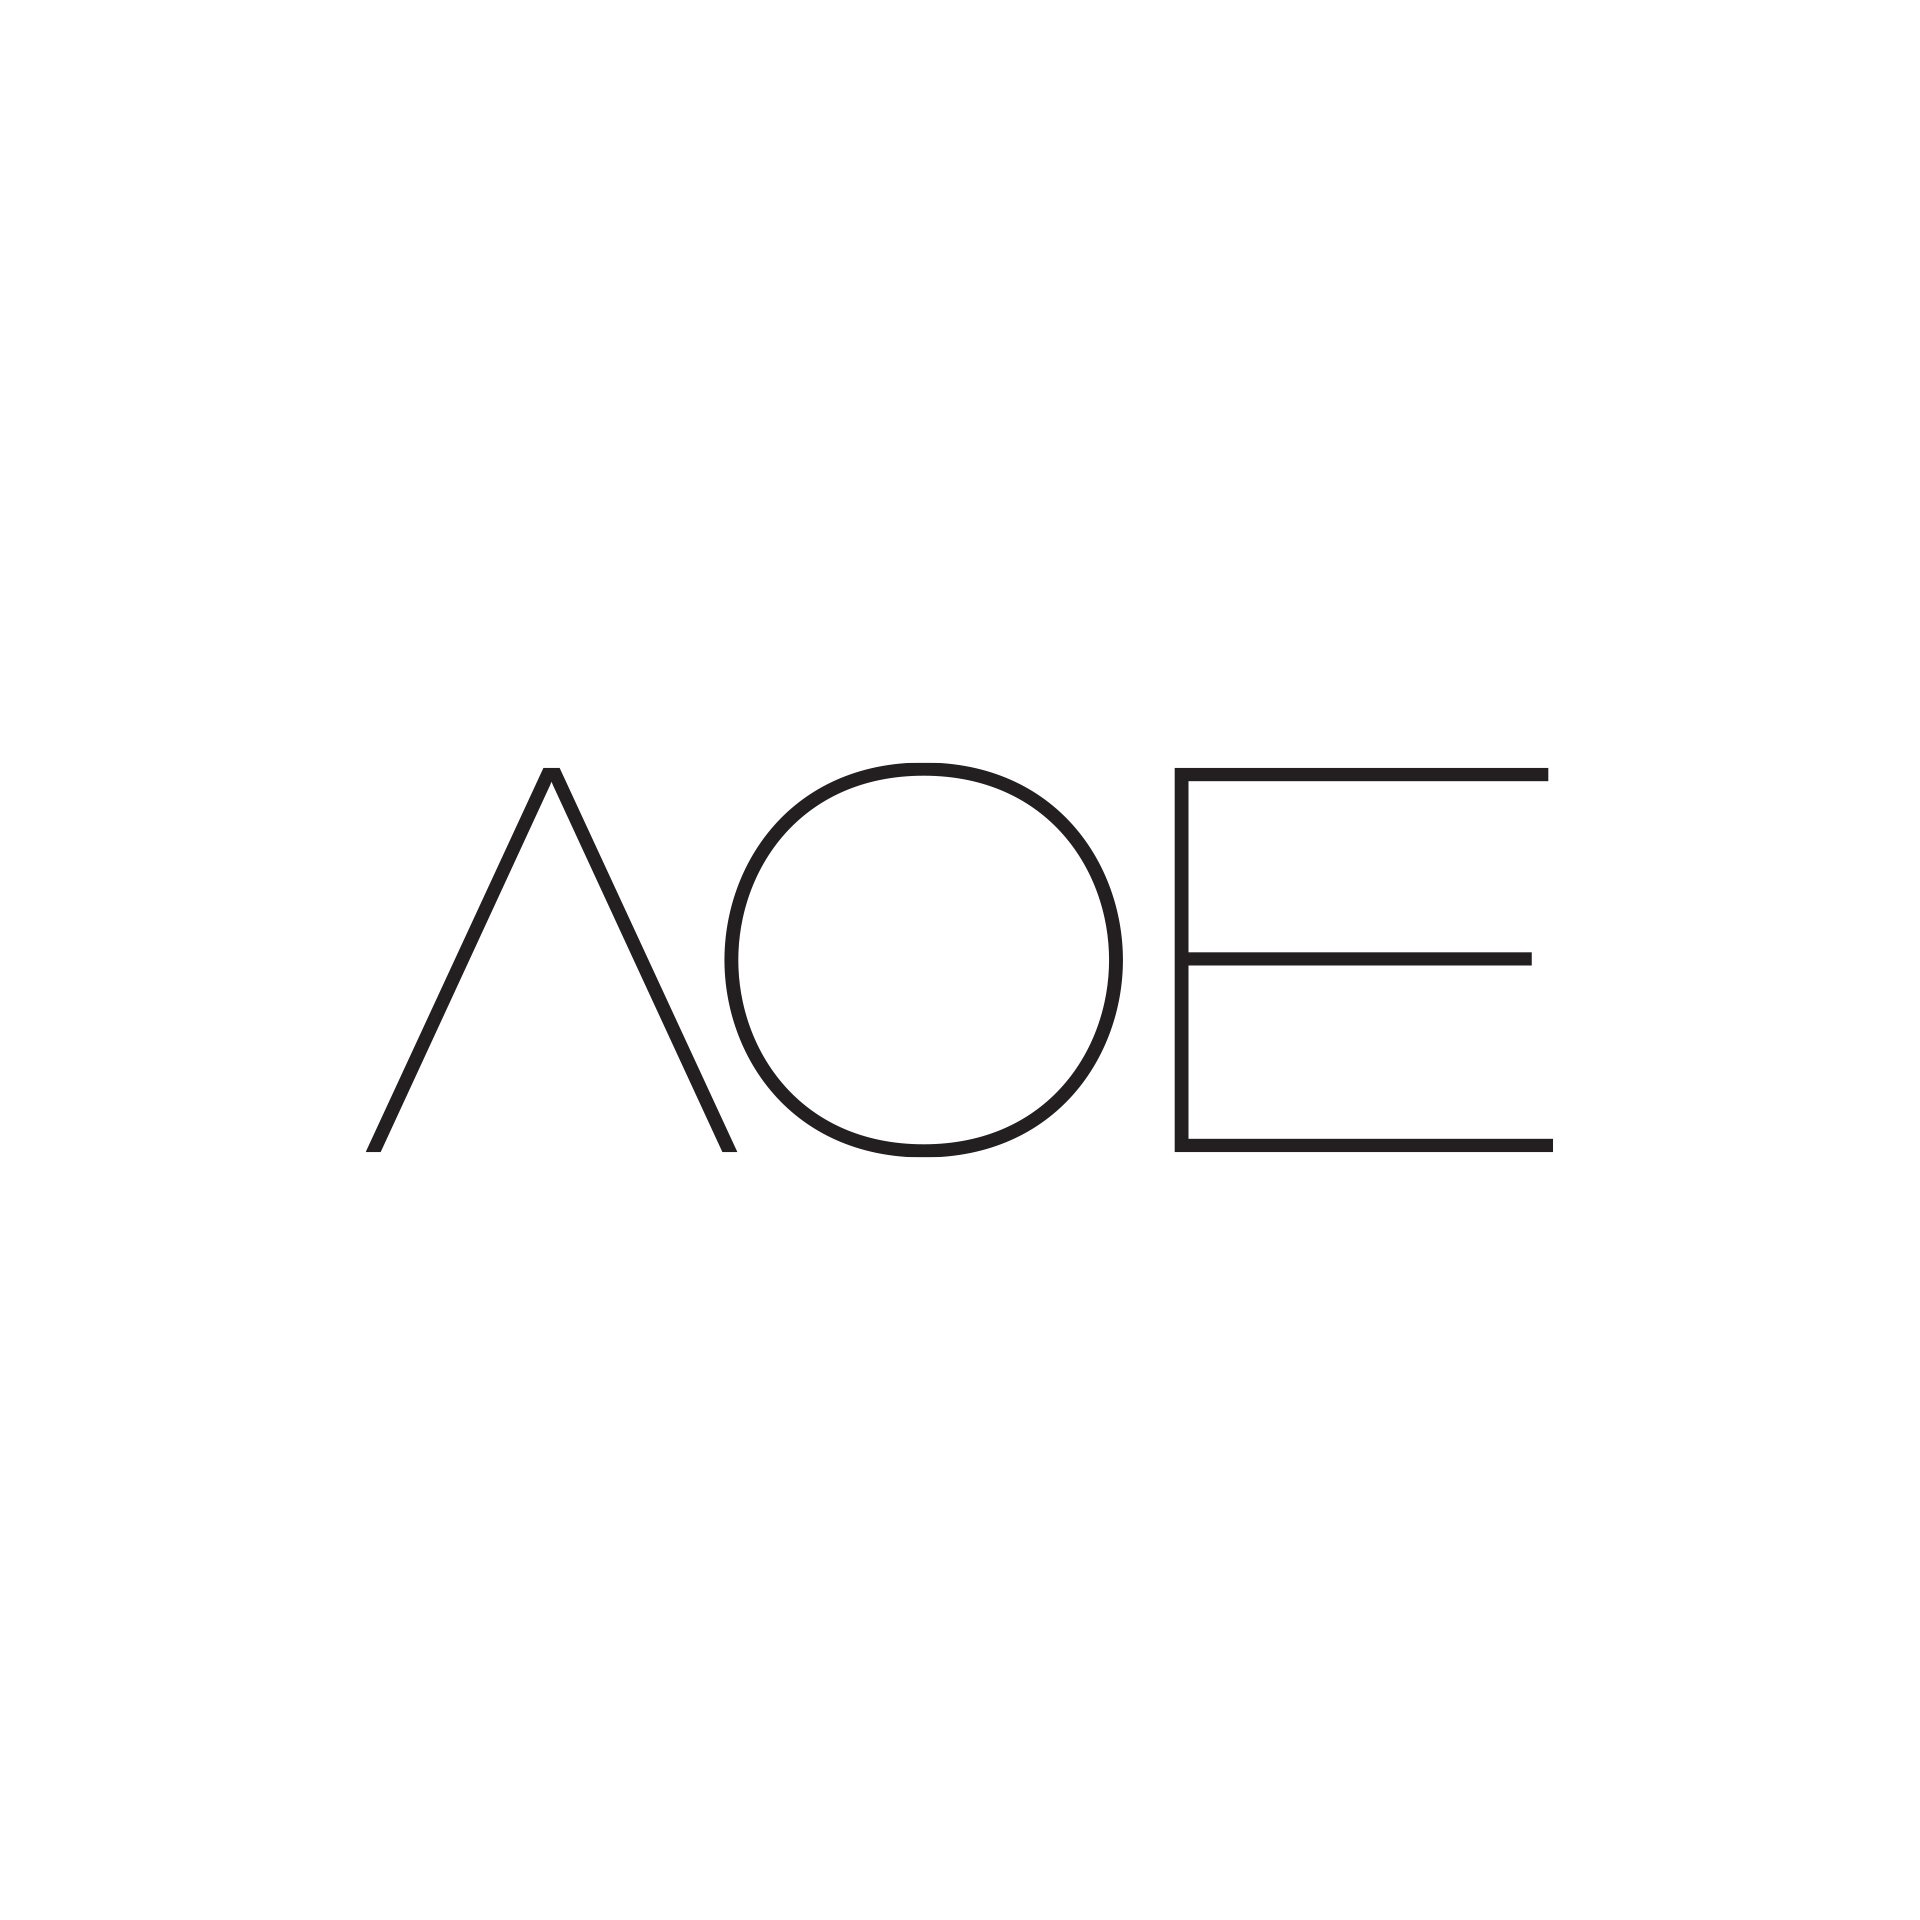 AOE wedding album identity design logo